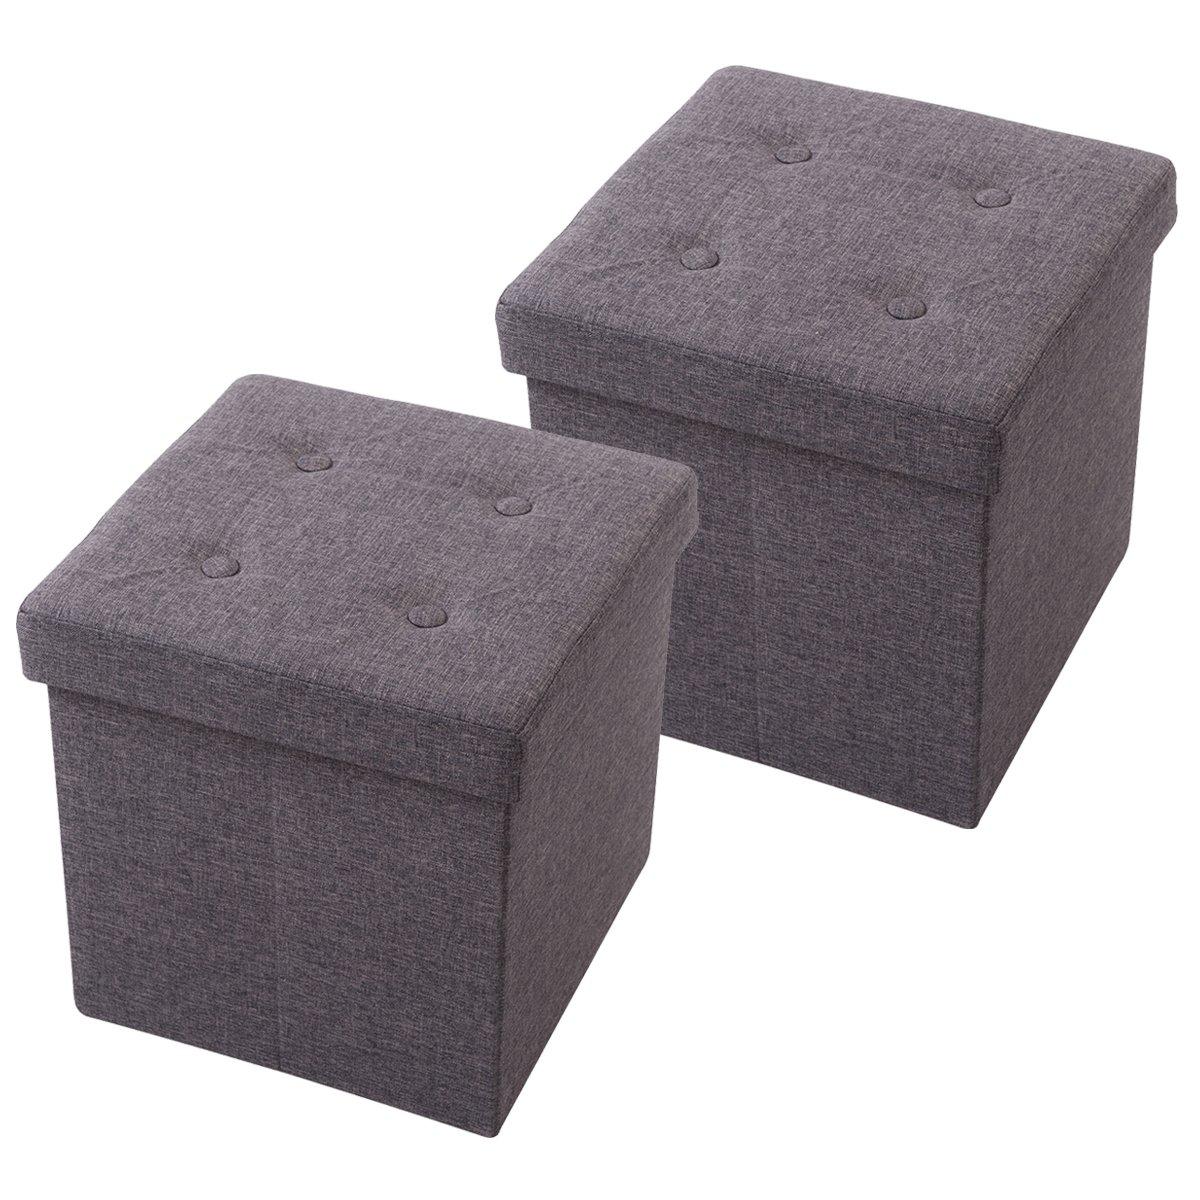 Kokomix Polyester Folding Storage Ottoman Cube Foot Rest Stool Seat, Dark Gray, Set of 2